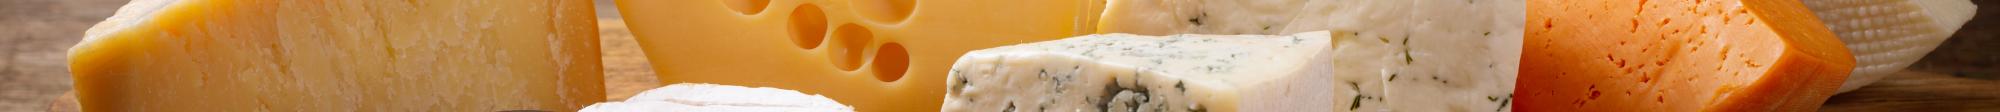 Comprar  quesos Añejos gourmet online   Mixtura Gourmet